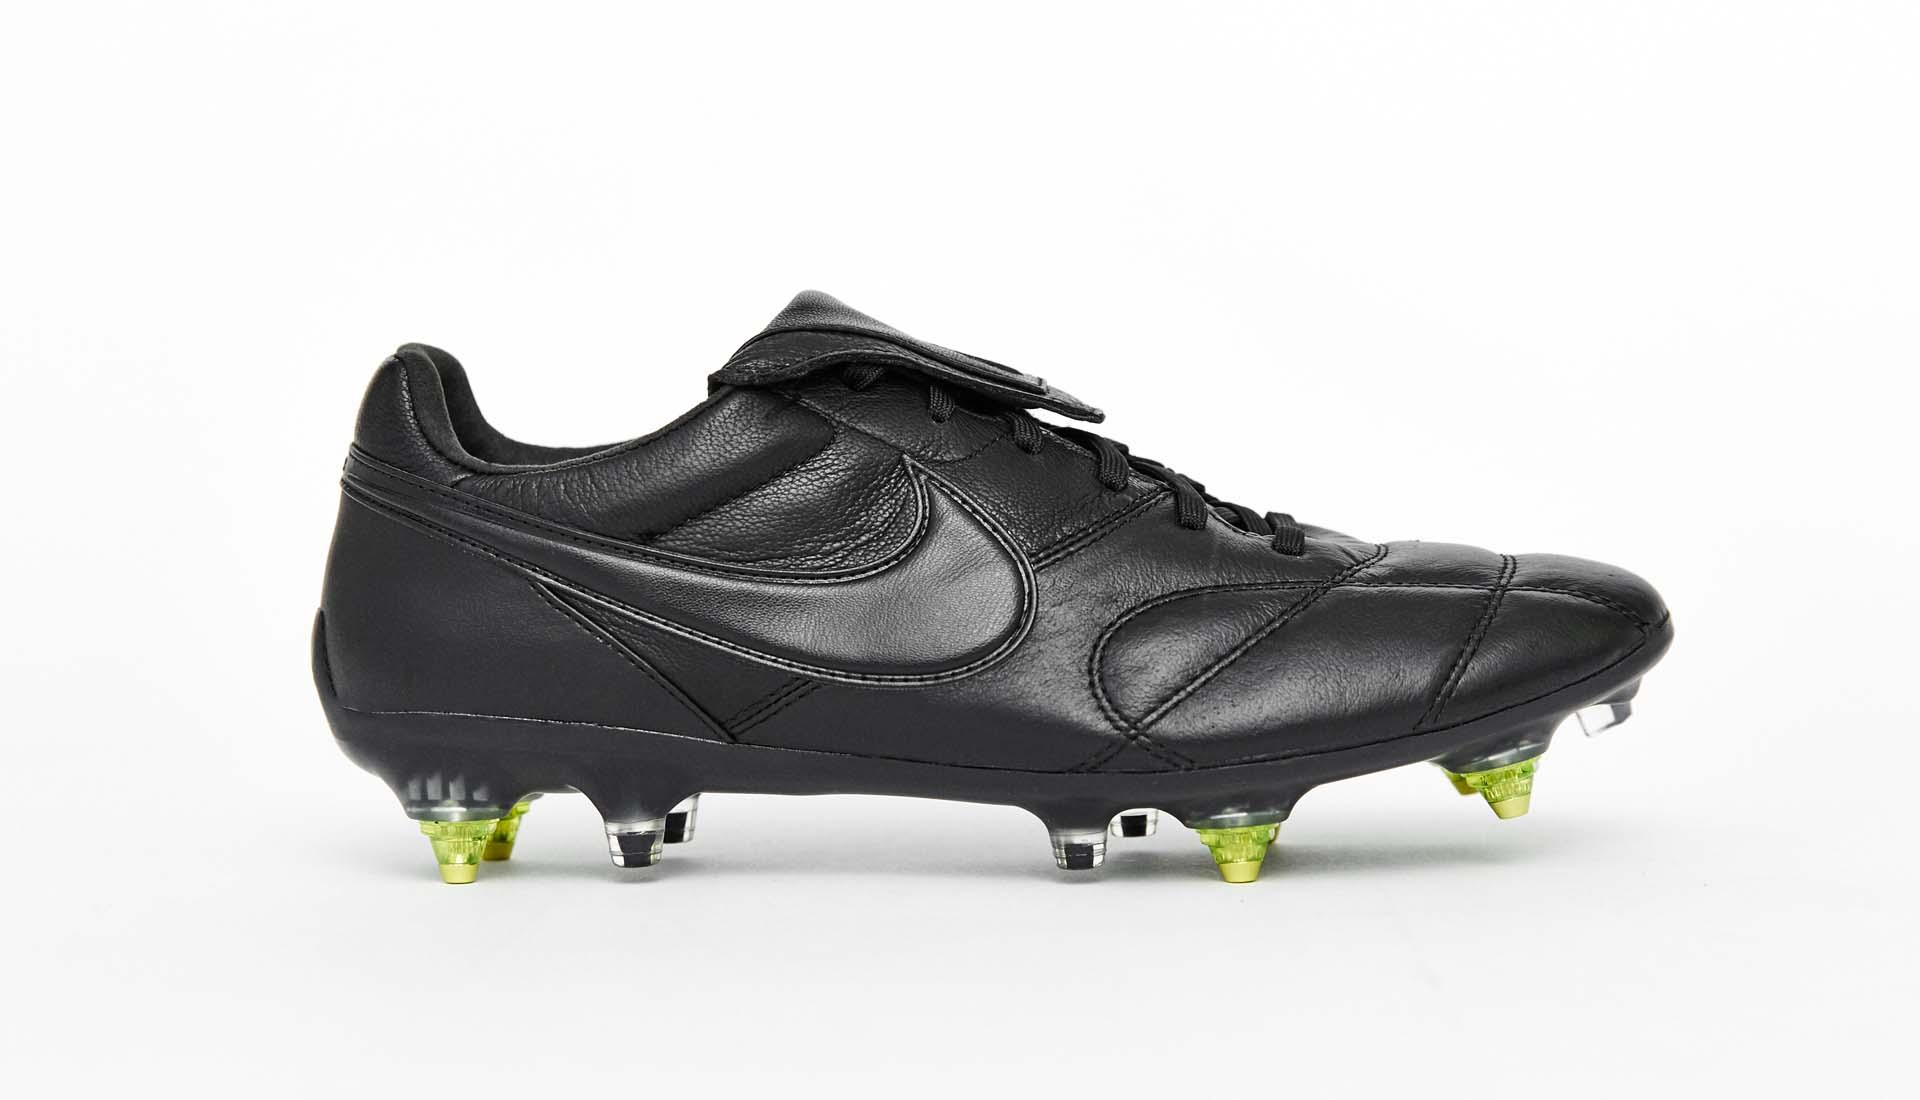 ae266afe4 Nike Premier II Anti-Clog Triple Black Football Boots - SoccerBible